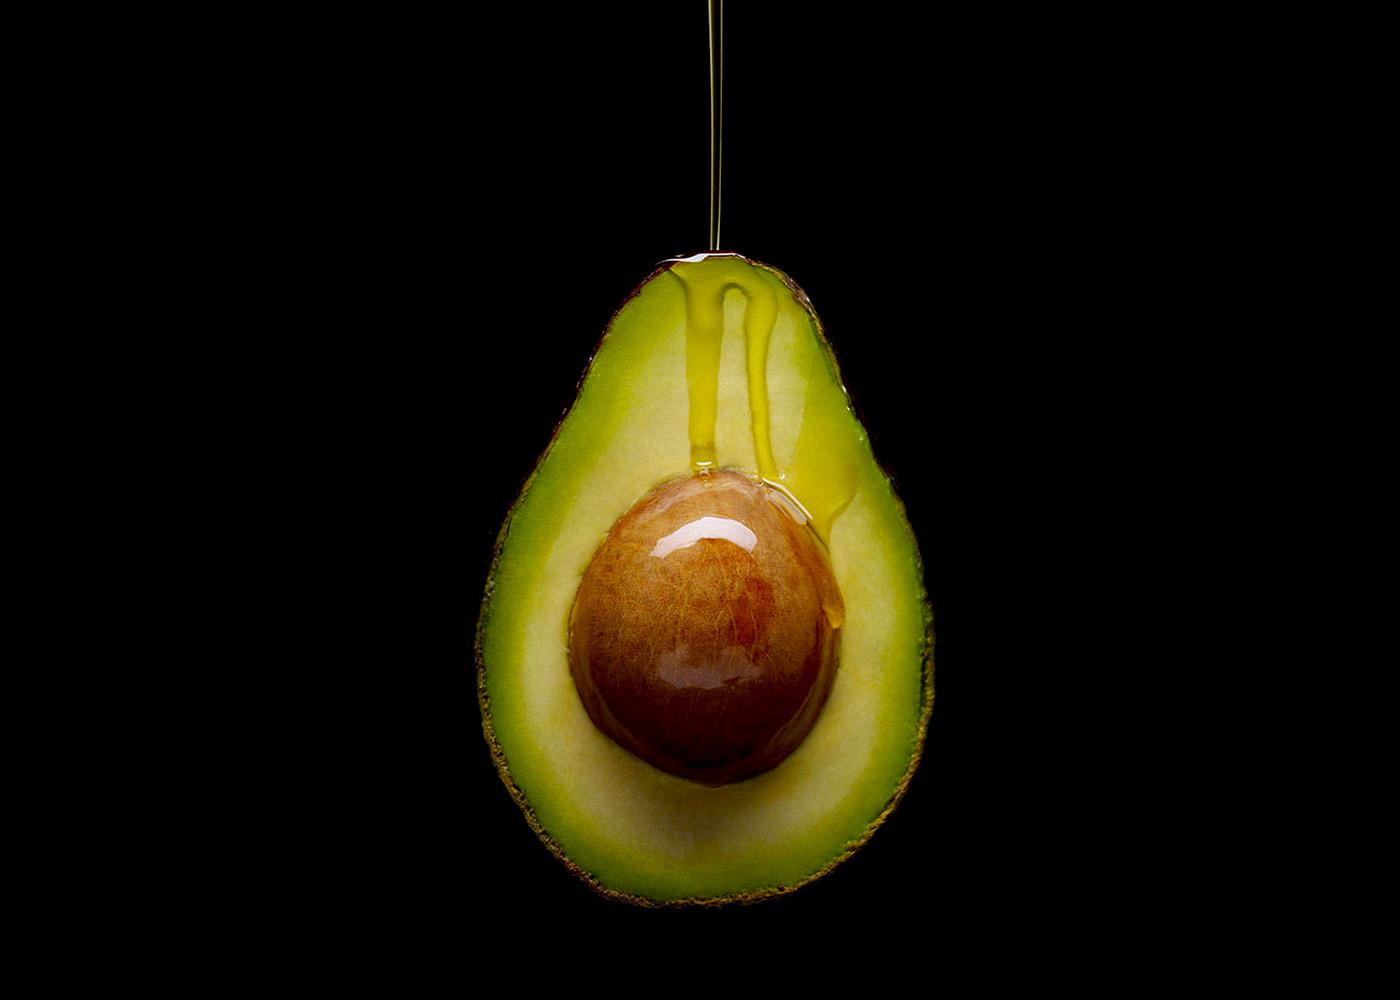 Oil dripping on avocado